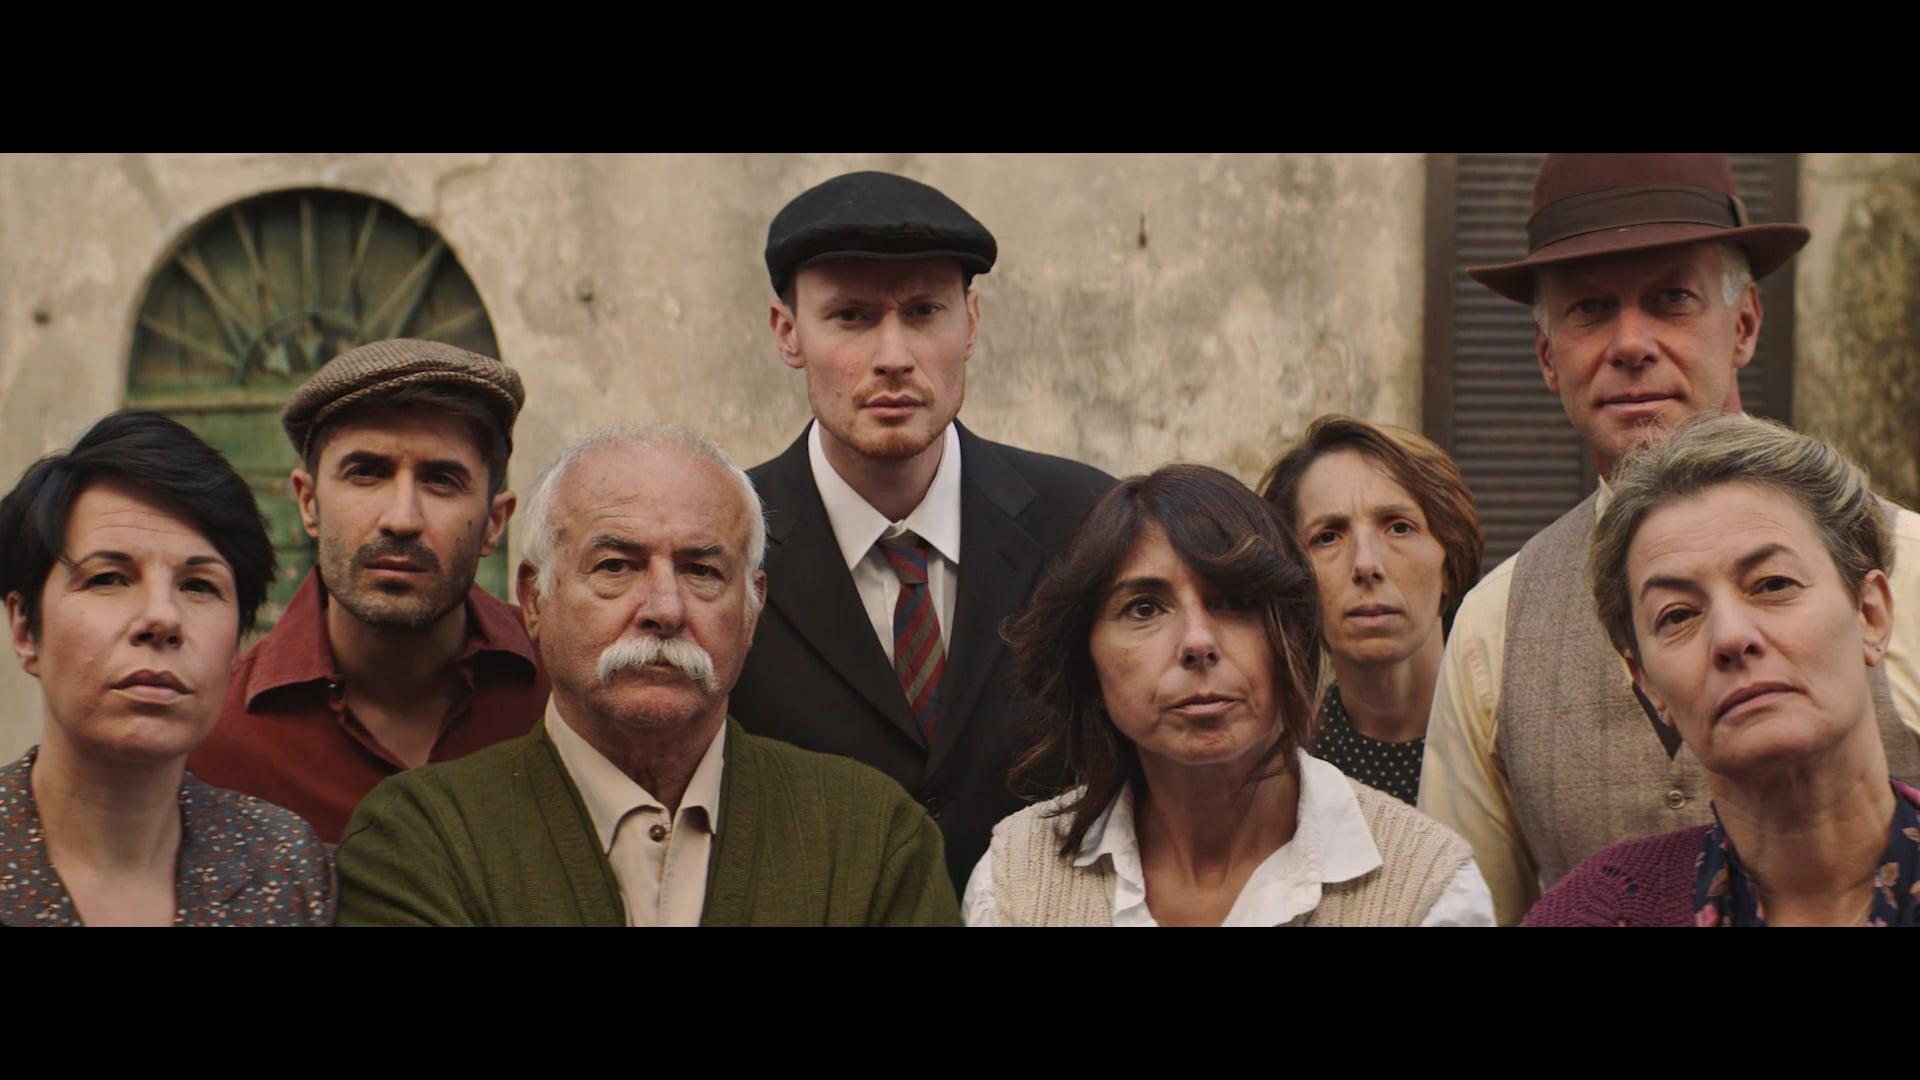 La Tela e la Maschera - Trailer - Short Film